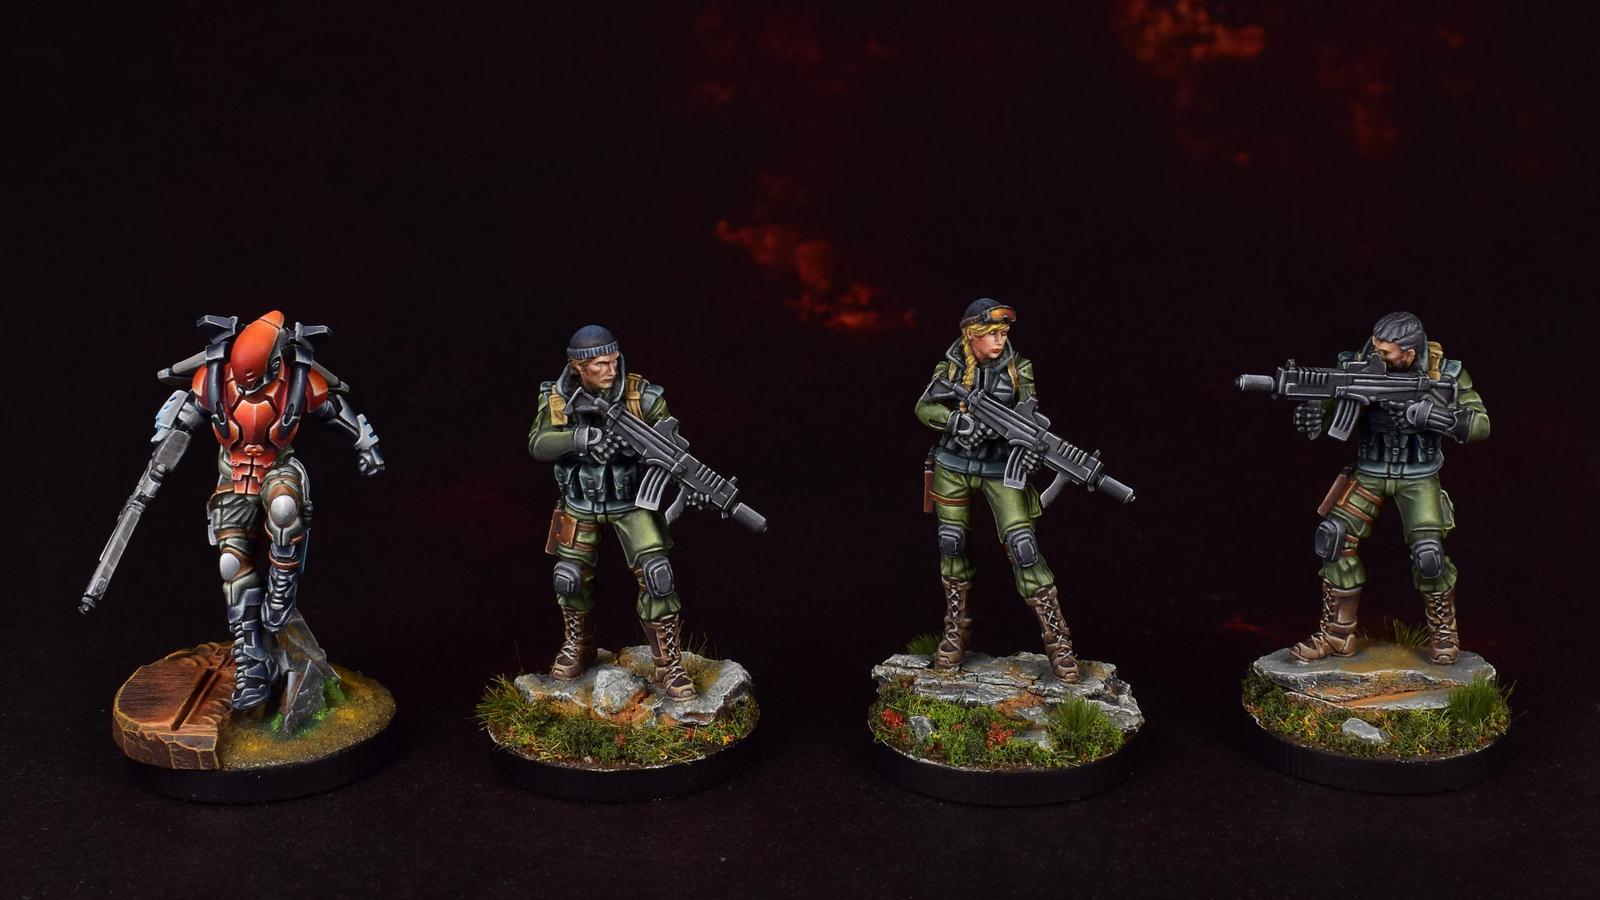 Ariadna, Hellcat, Infinity, Line Kazaks, Nomads, Tartary Army Corps